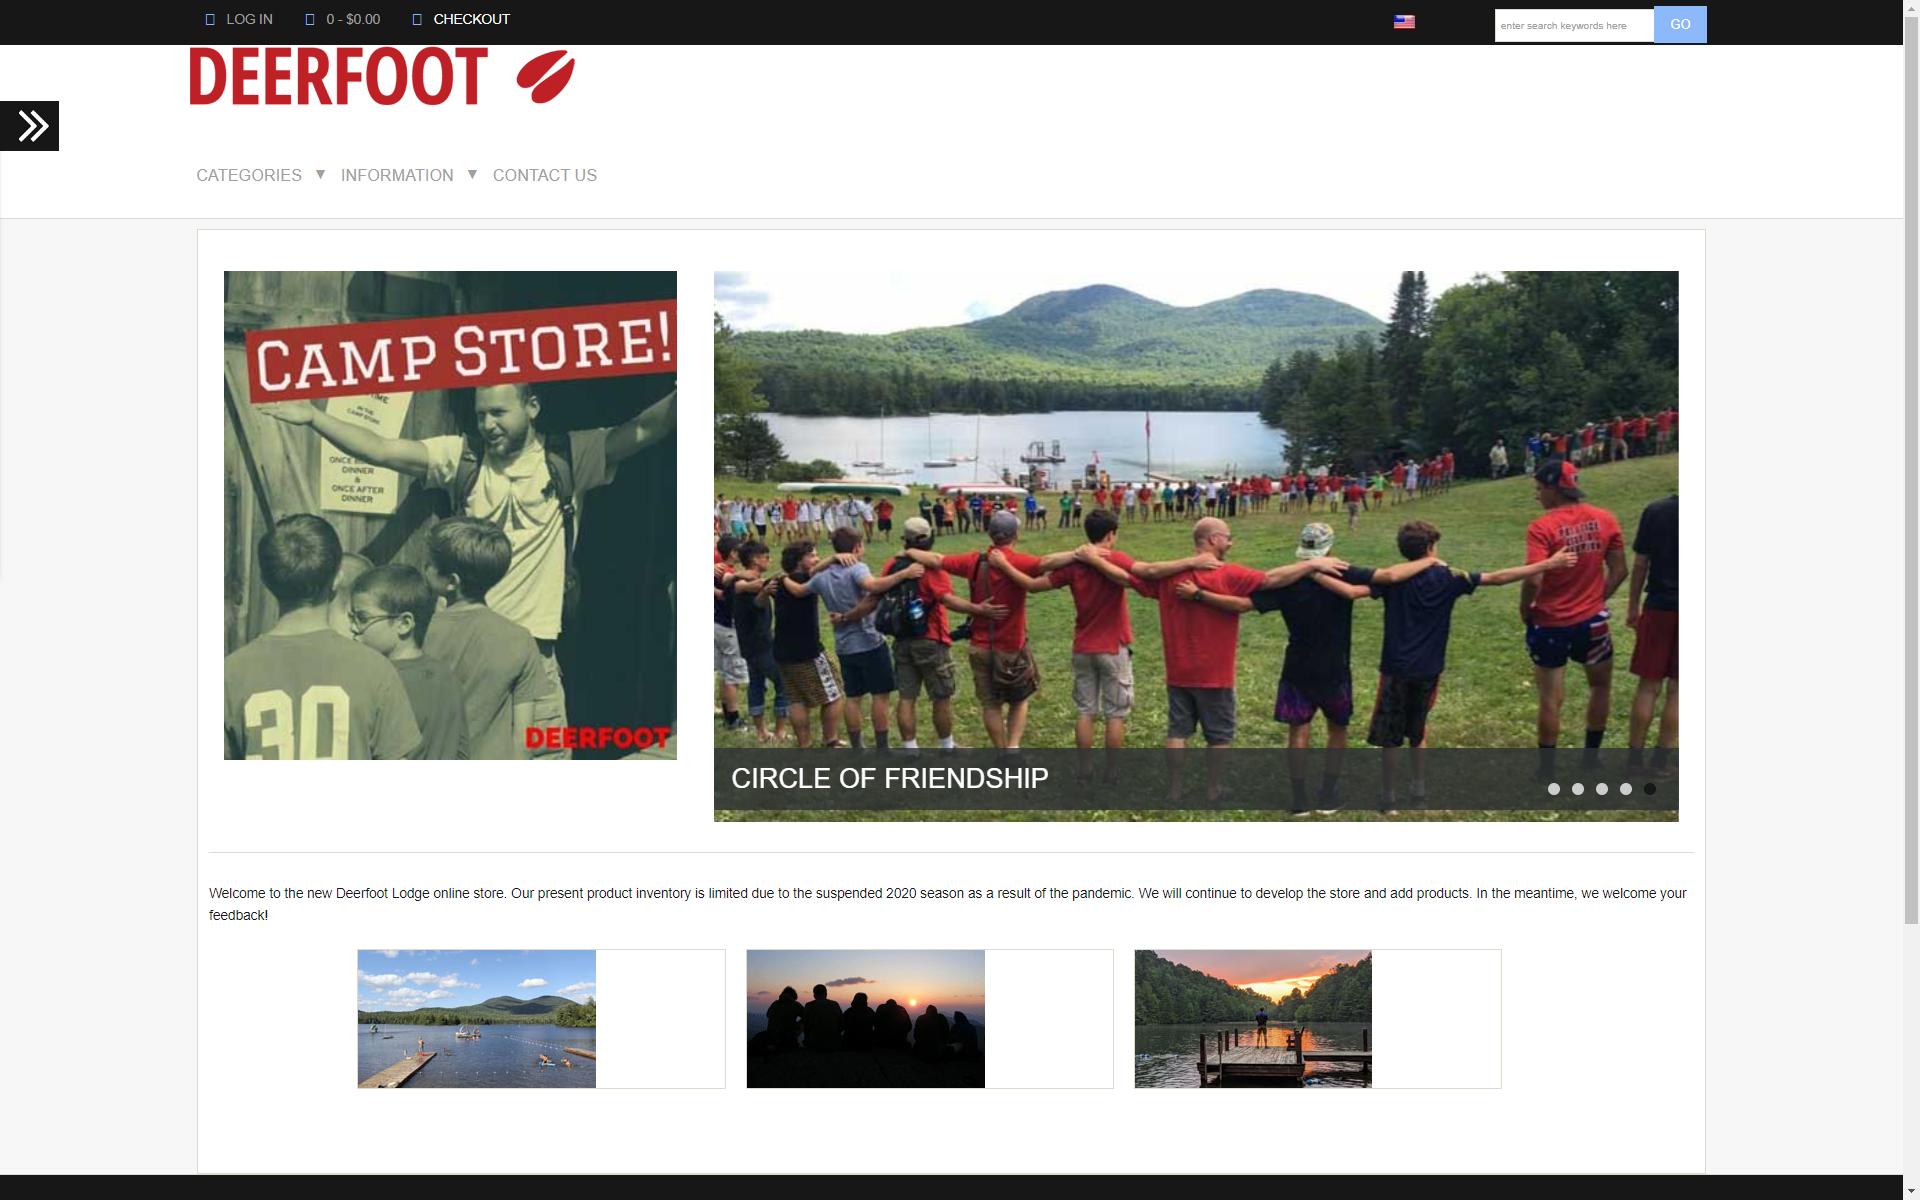 Online Camp Store is Open!